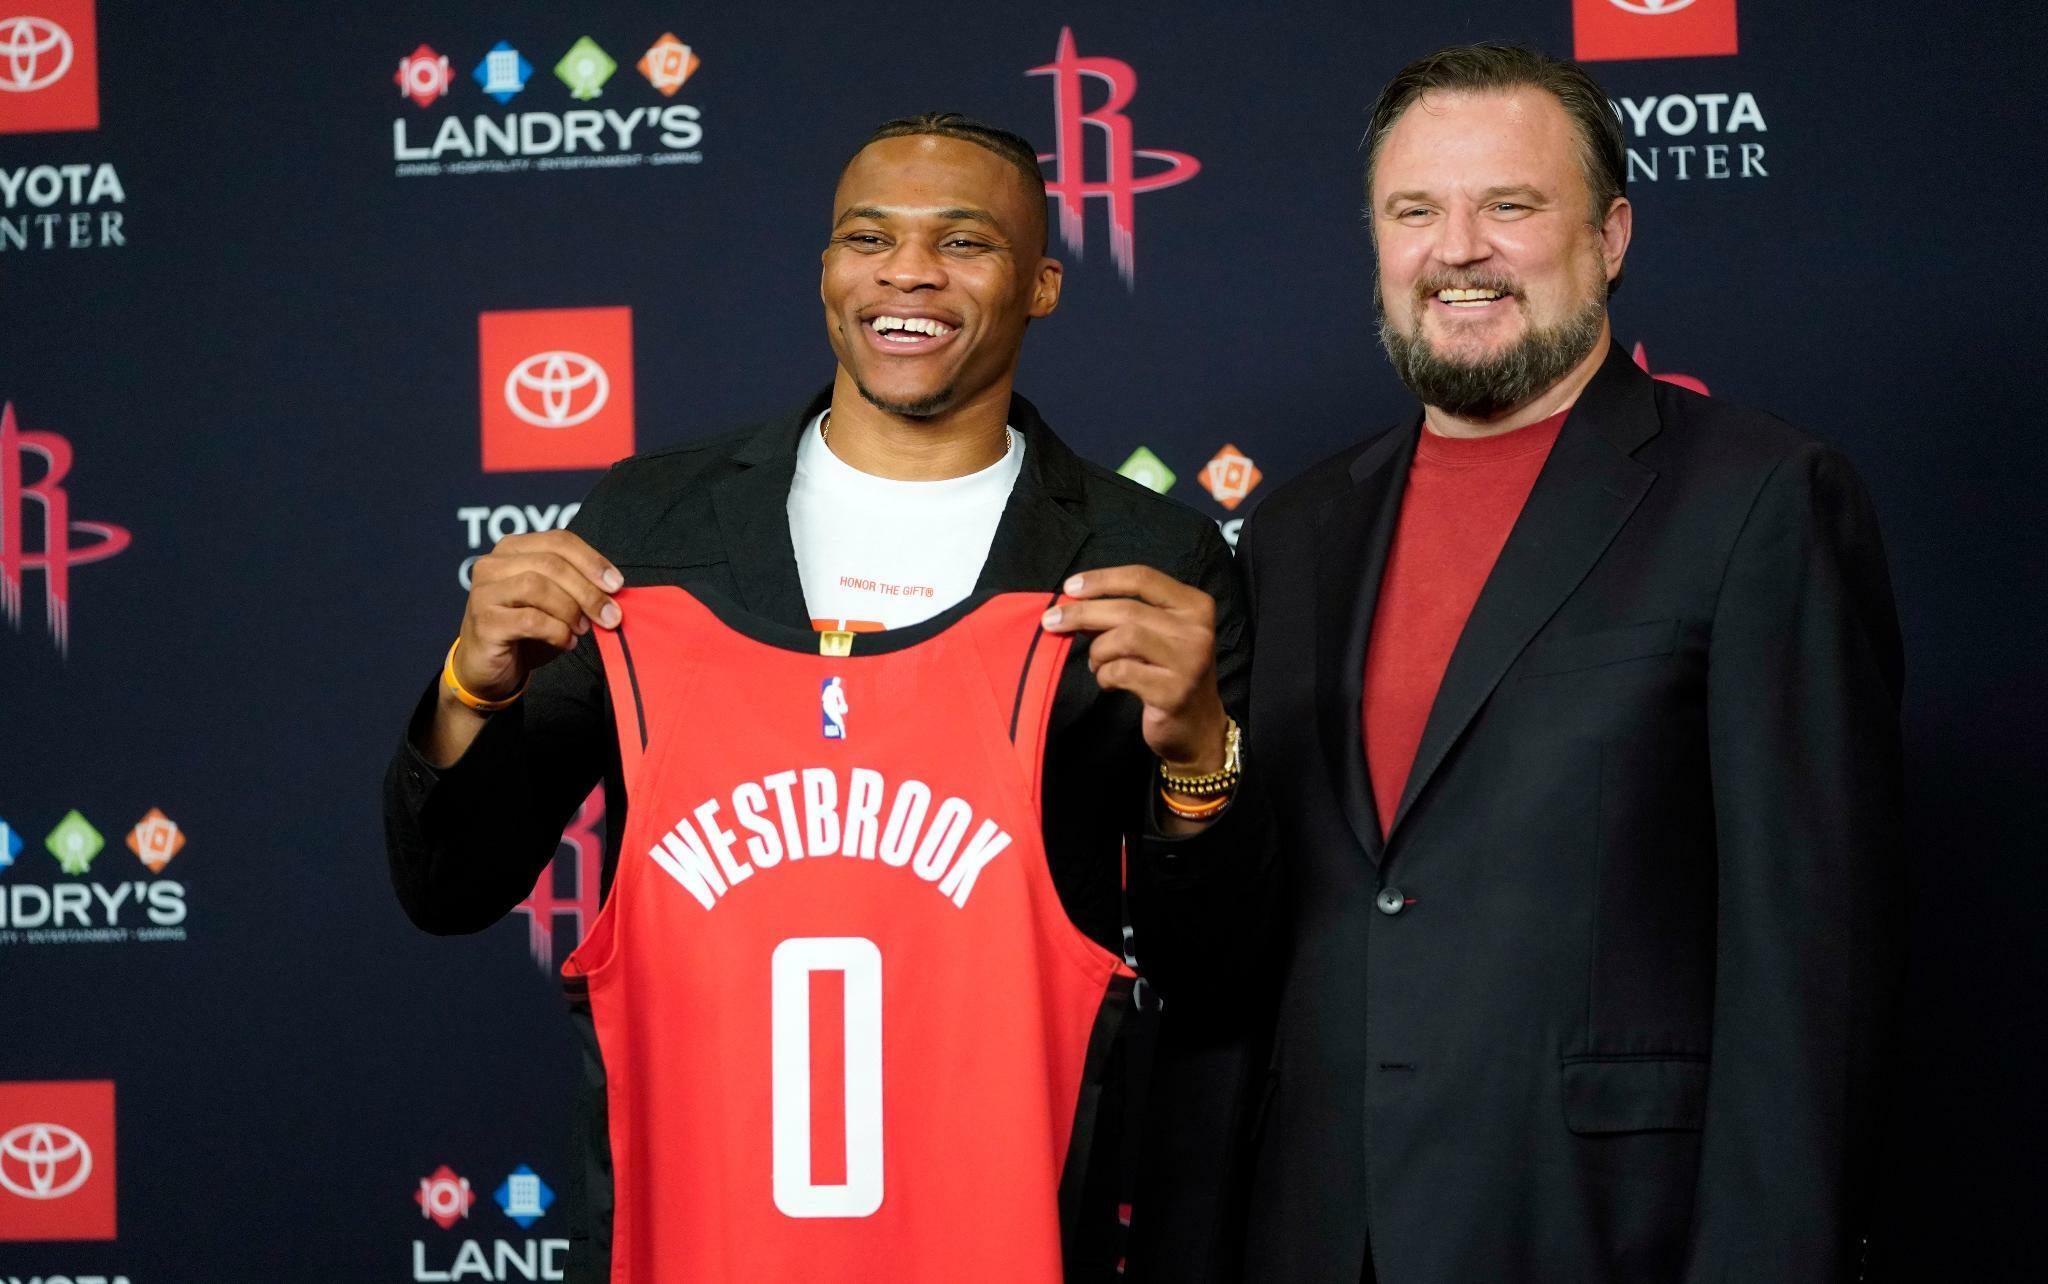 Kritischer Tweet: NBA-Boss verrät: China wollte Rockets-Manager gefeuert sehen